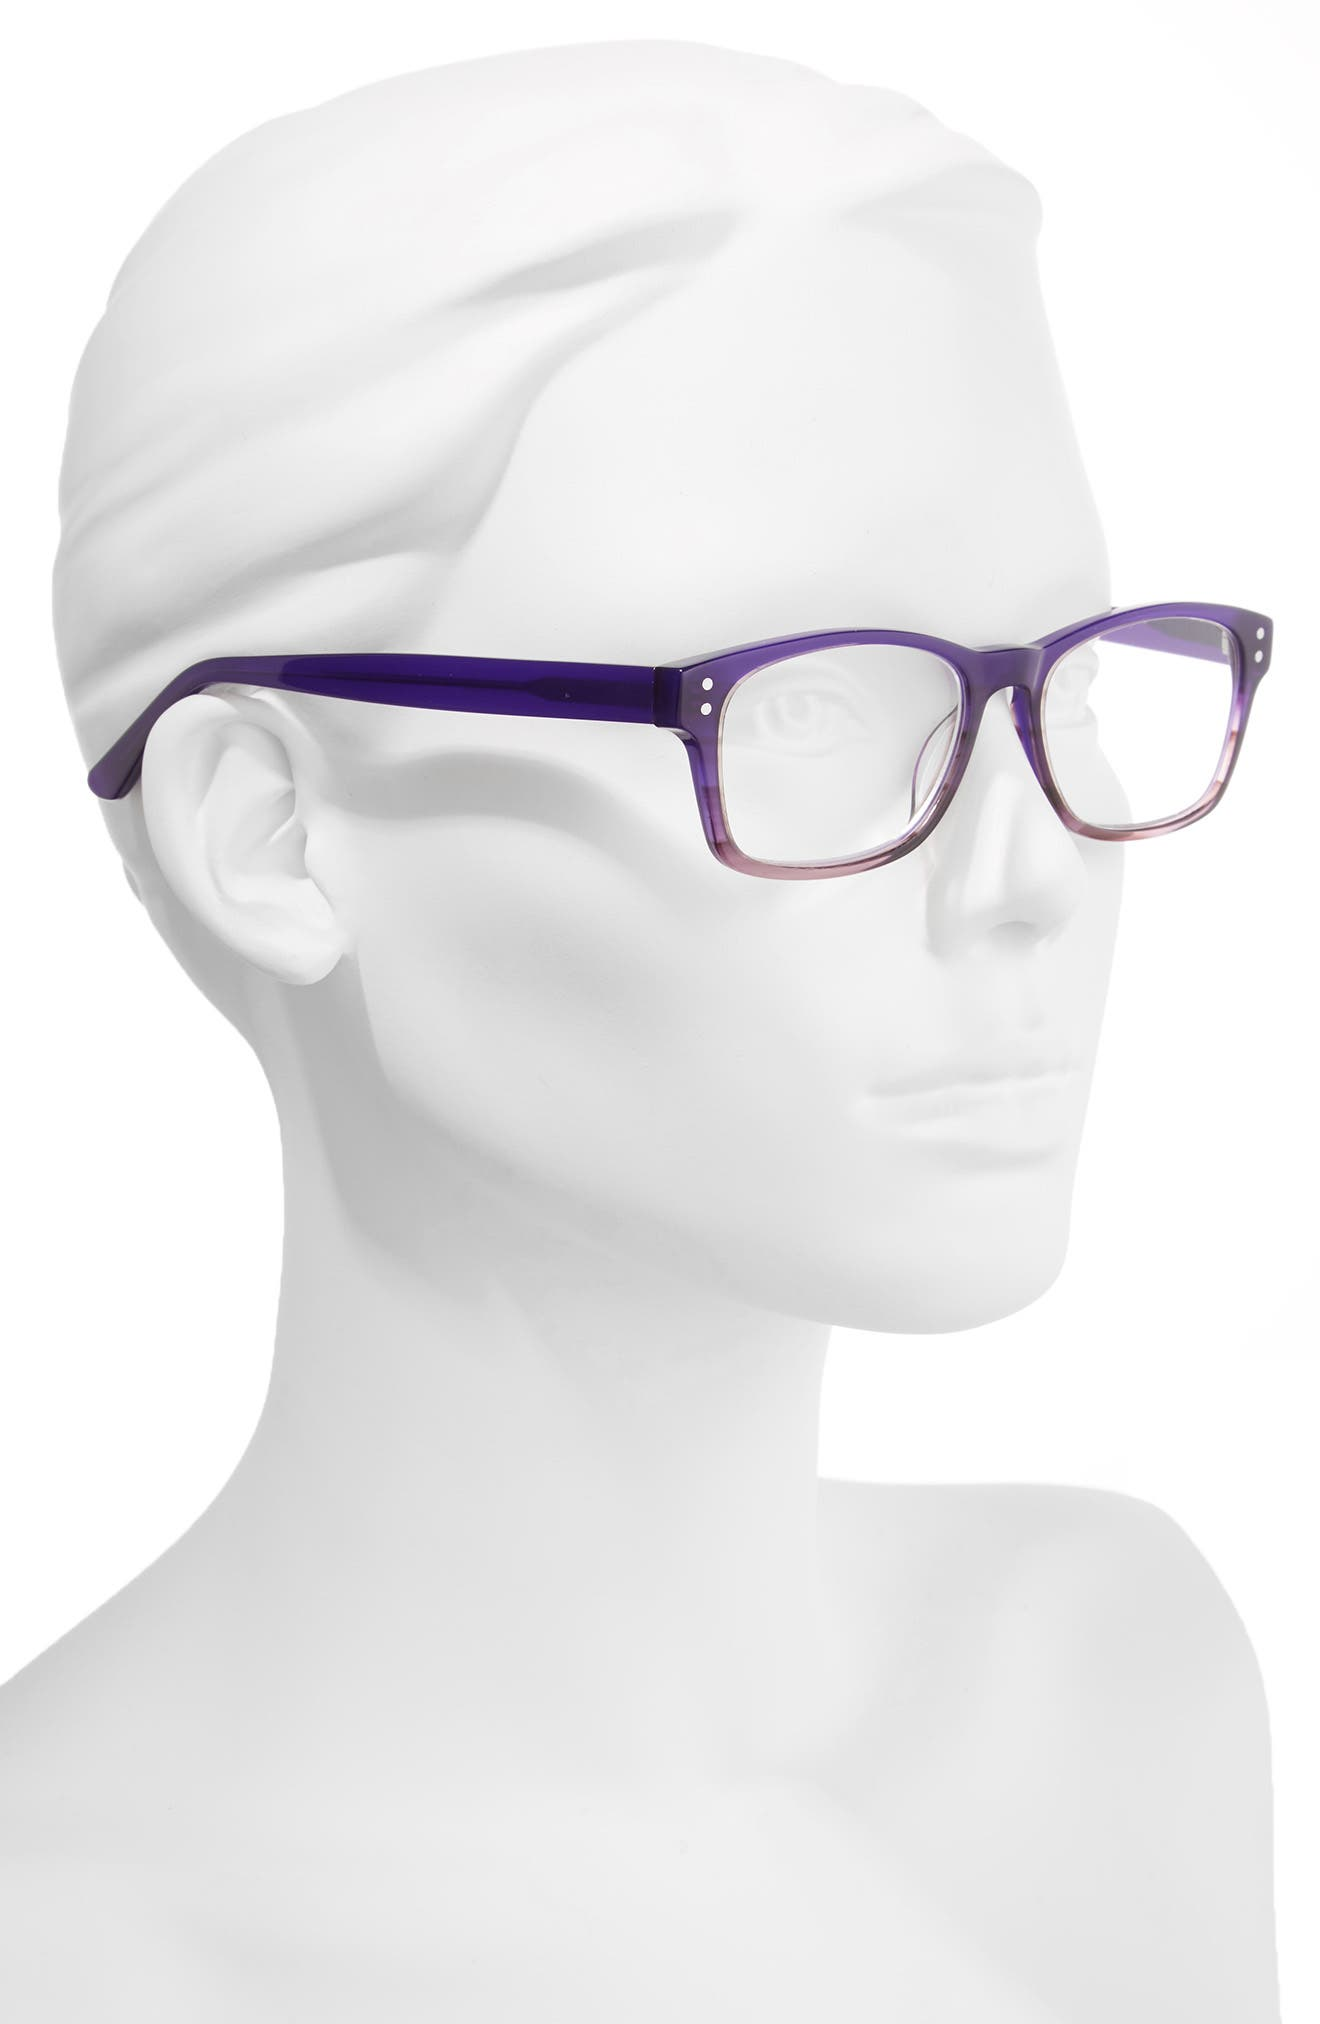 Edie 50mm Reading Glasses,                             Alternate thumbnail 2, color,                             500